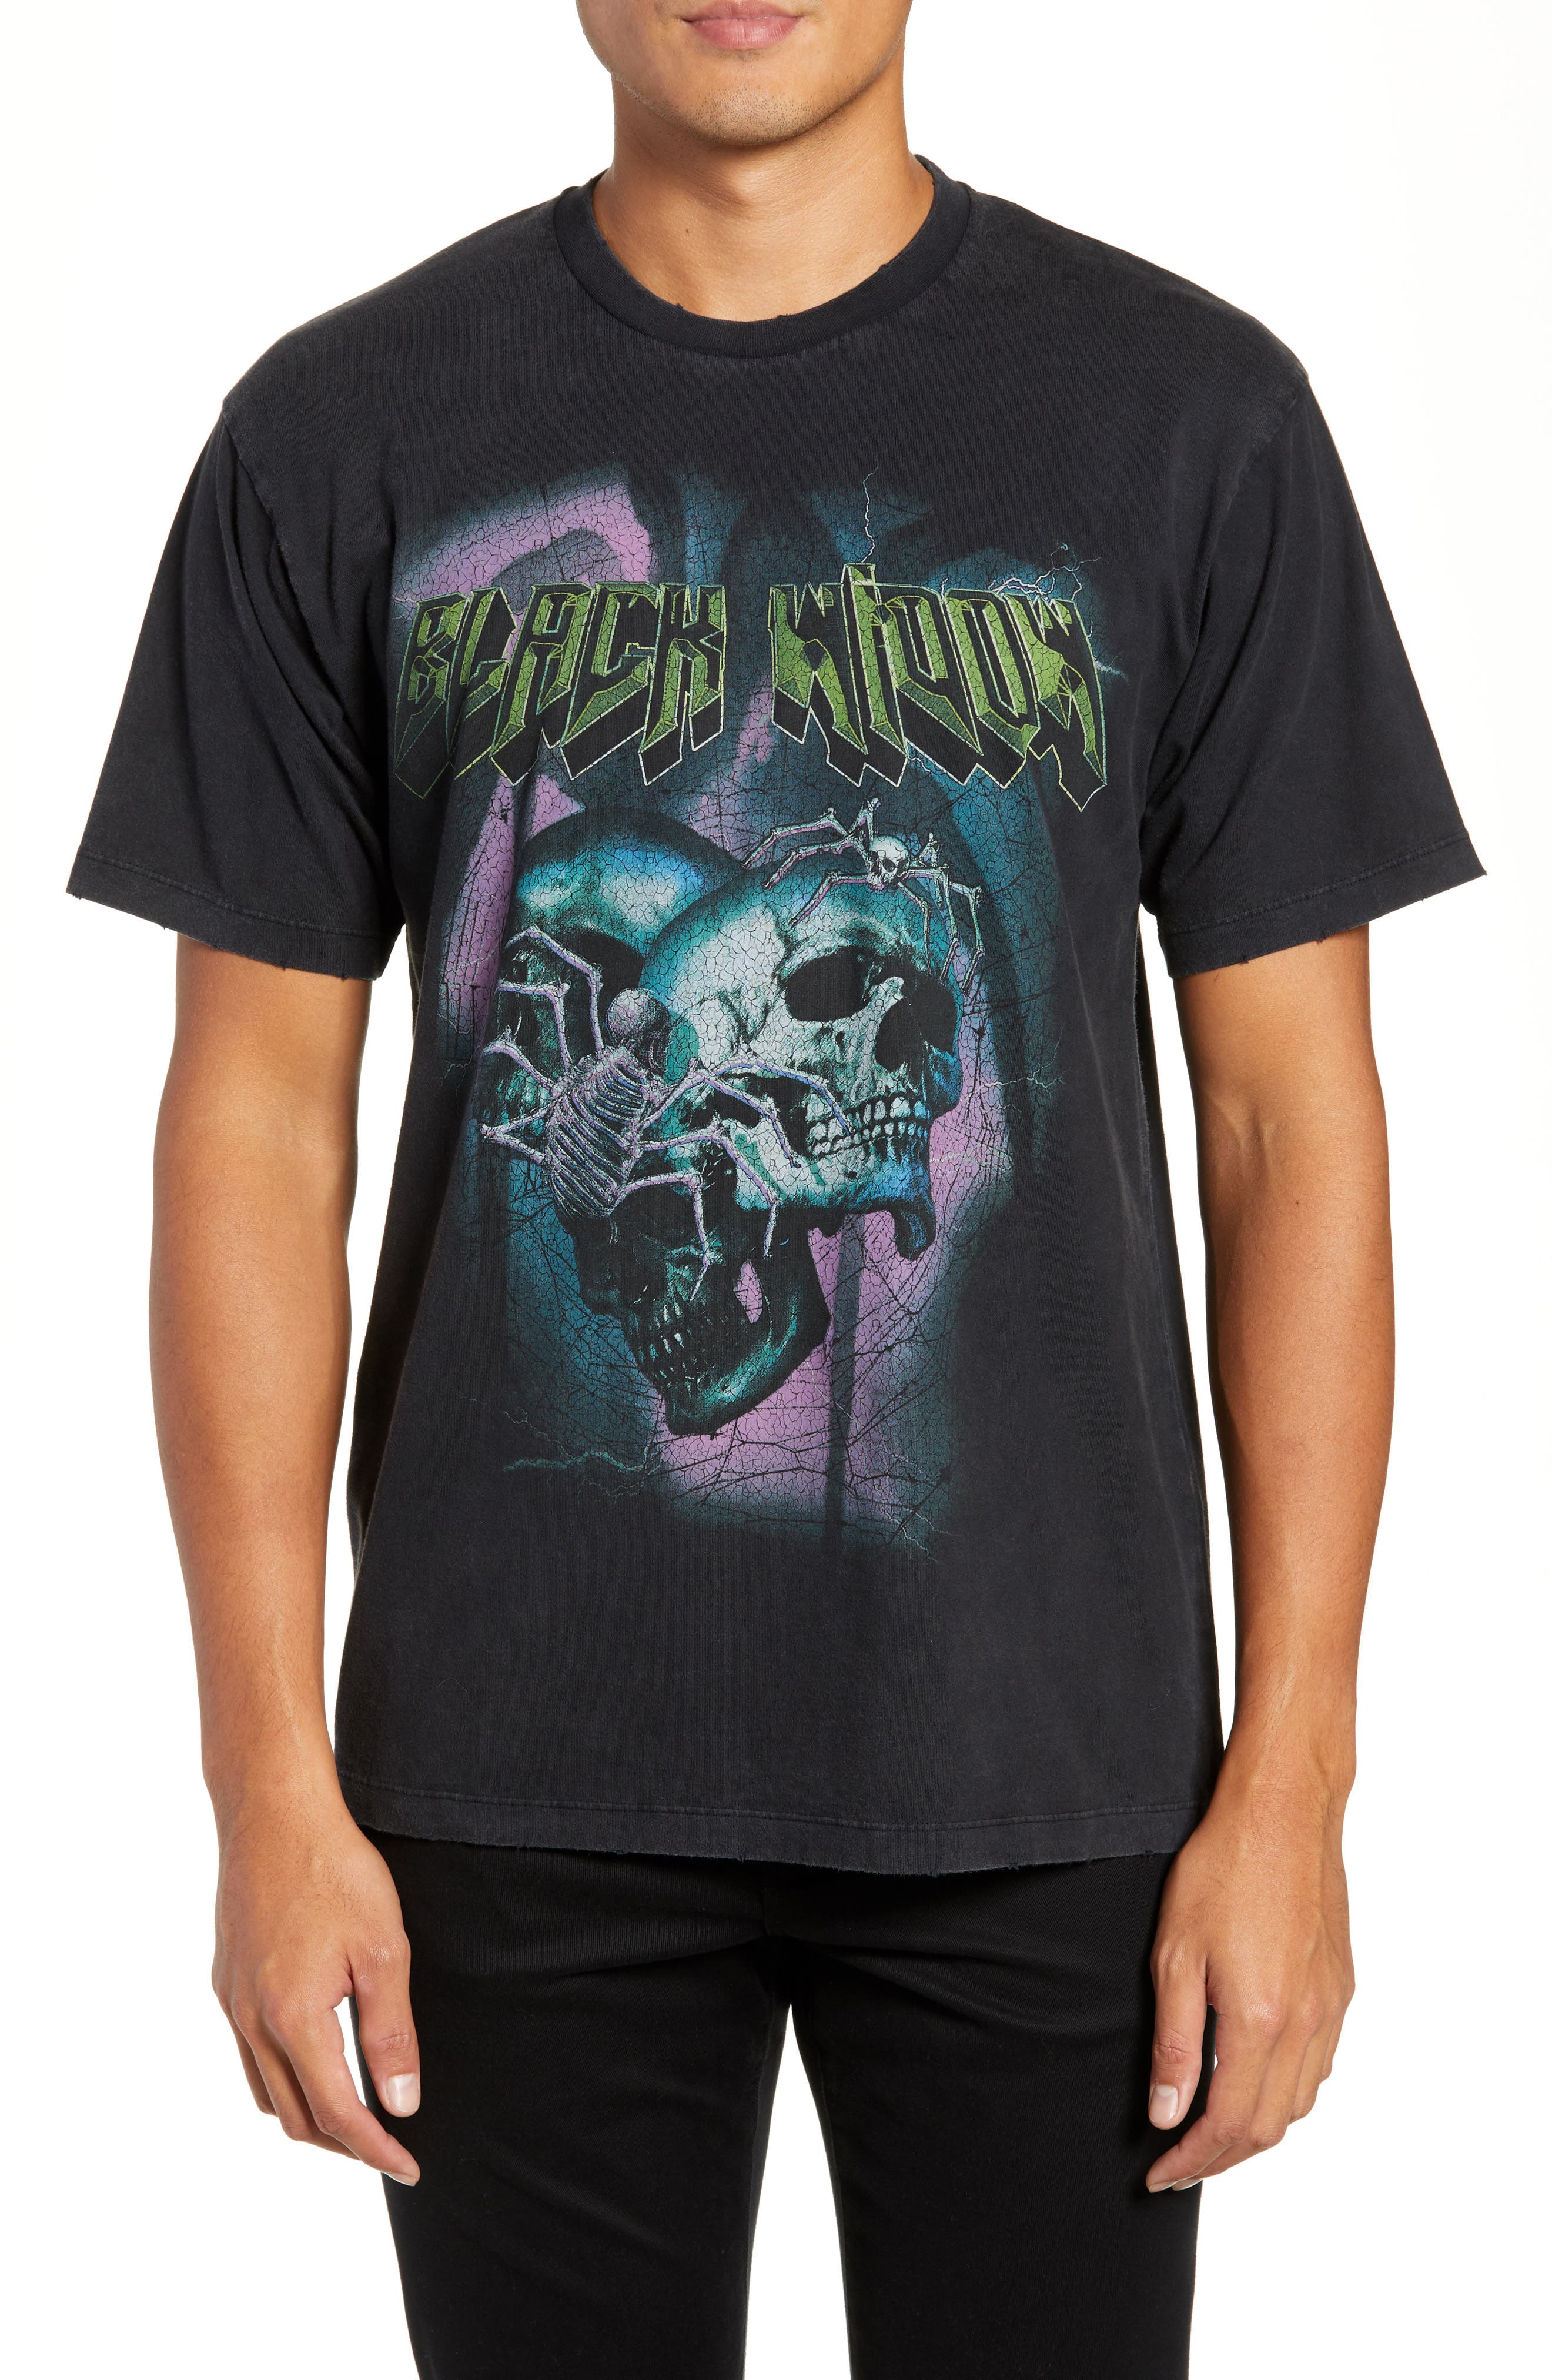 Black Widow Graphic T-Shirt,                         Main,                         color, 001